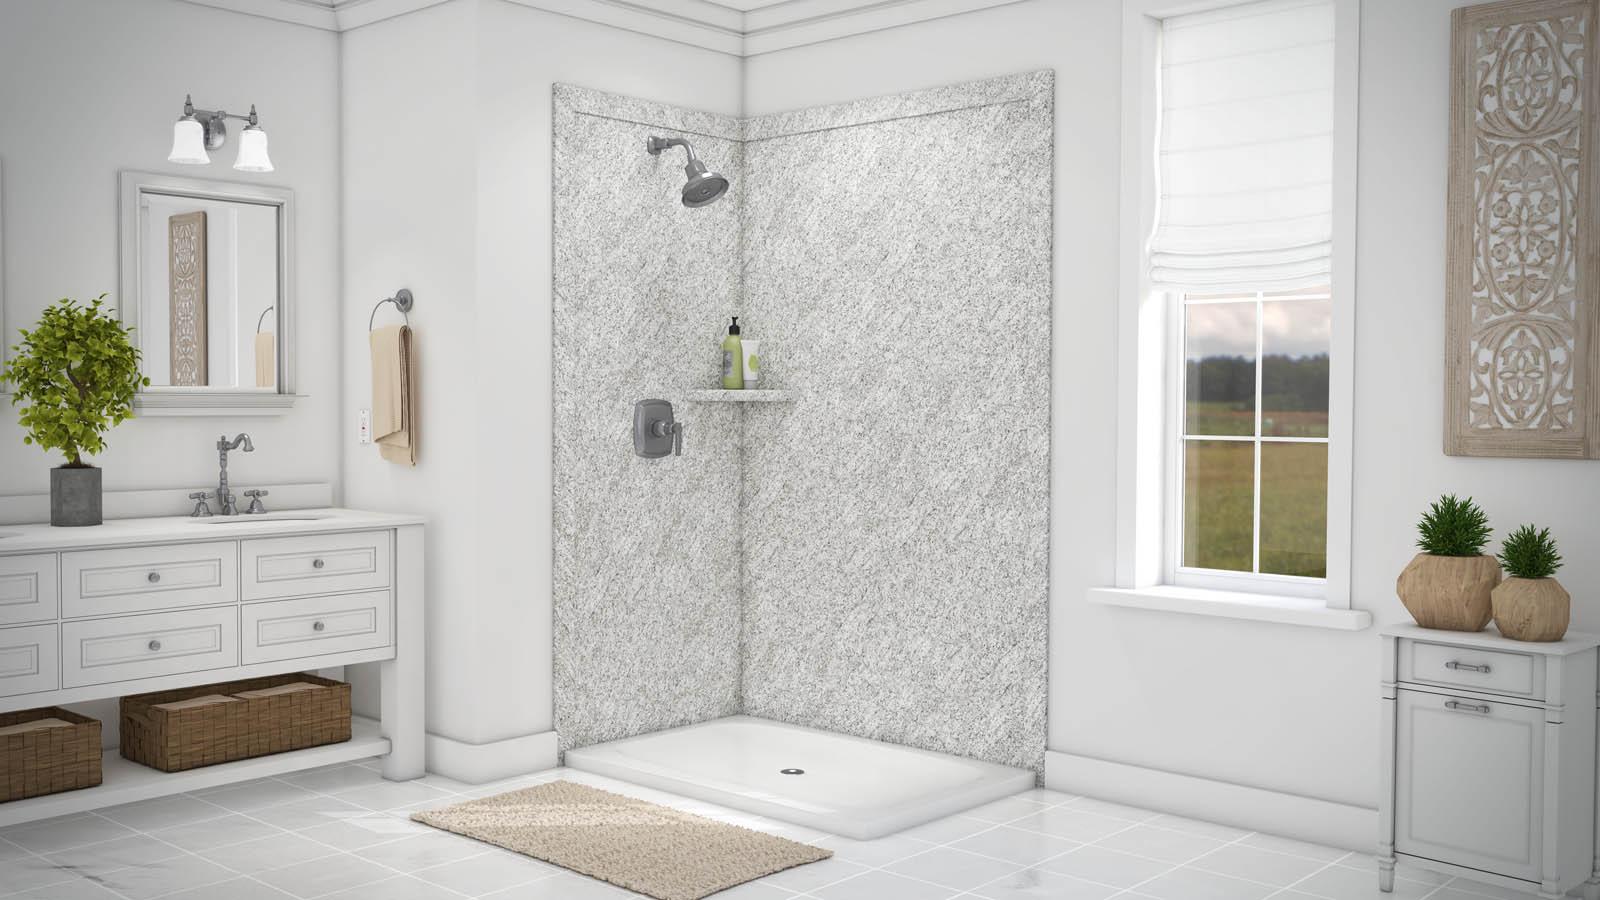 Flexstone Ssk48367821 Elegance 2 Wall Shower Kit Builtinz